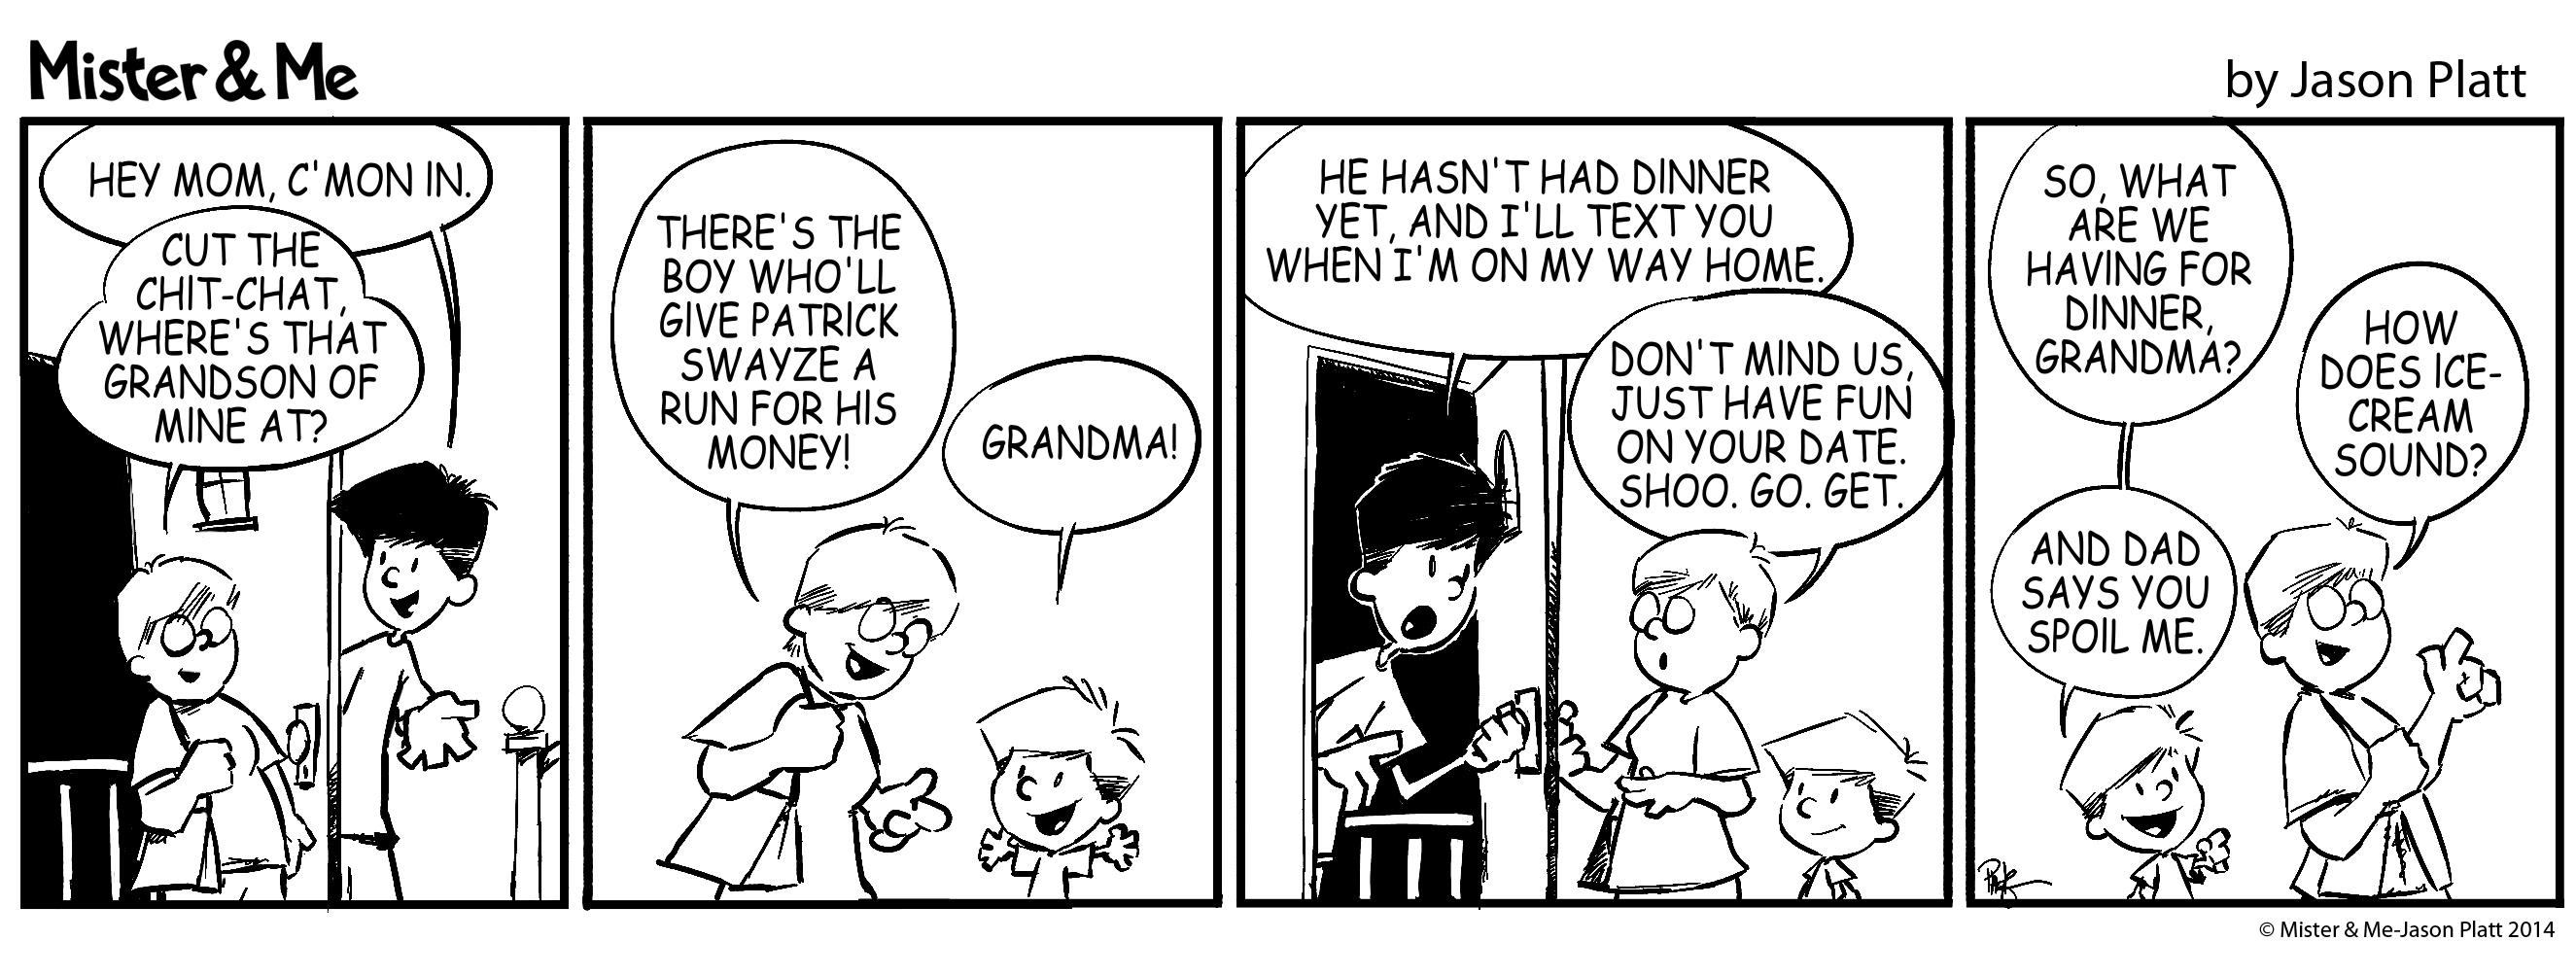 Enter Grandma